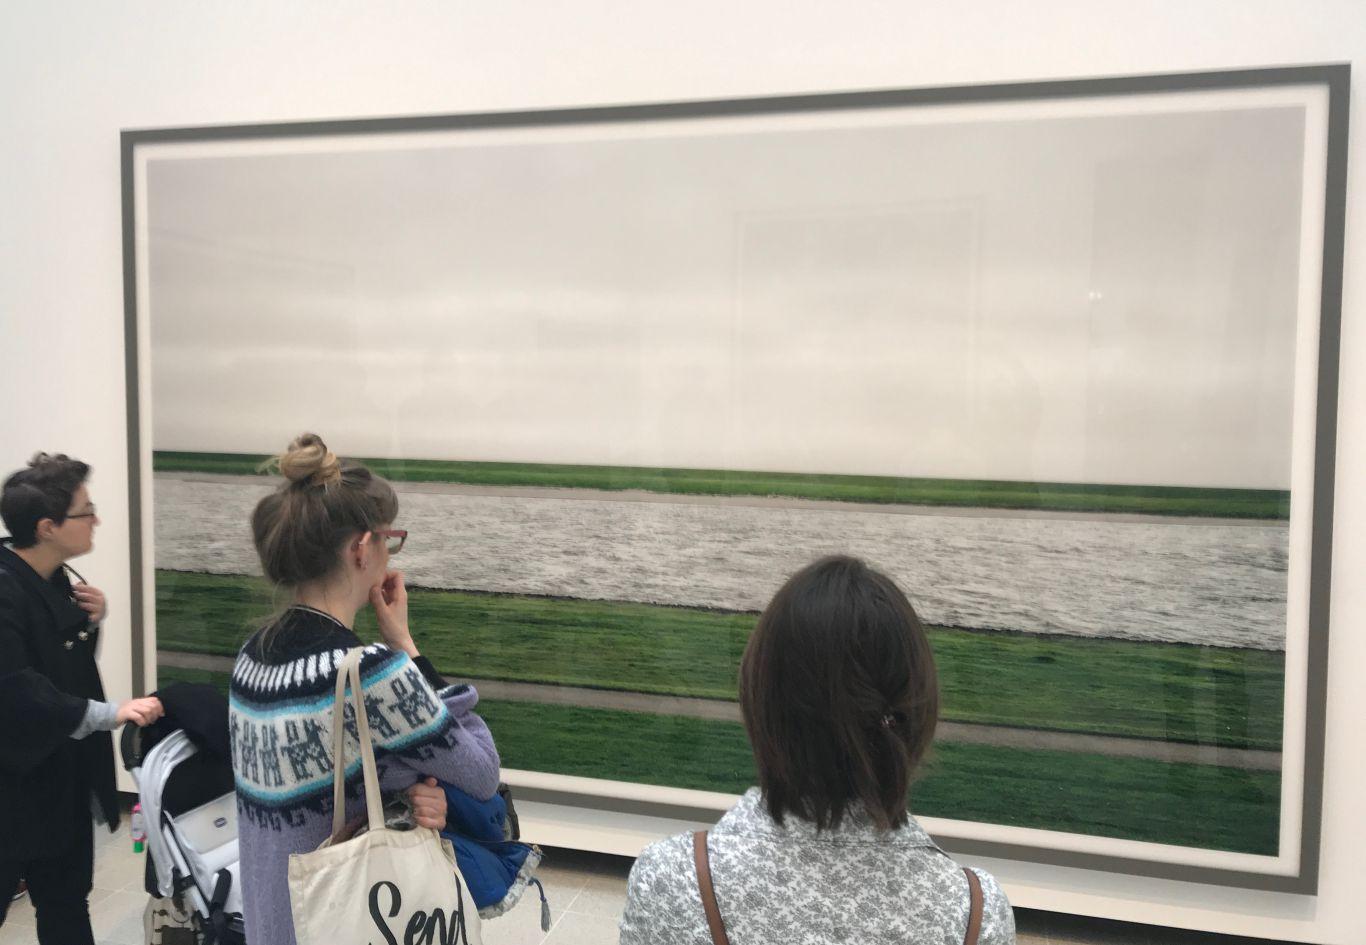 Three spectators gaze at Andreas Gursky photo